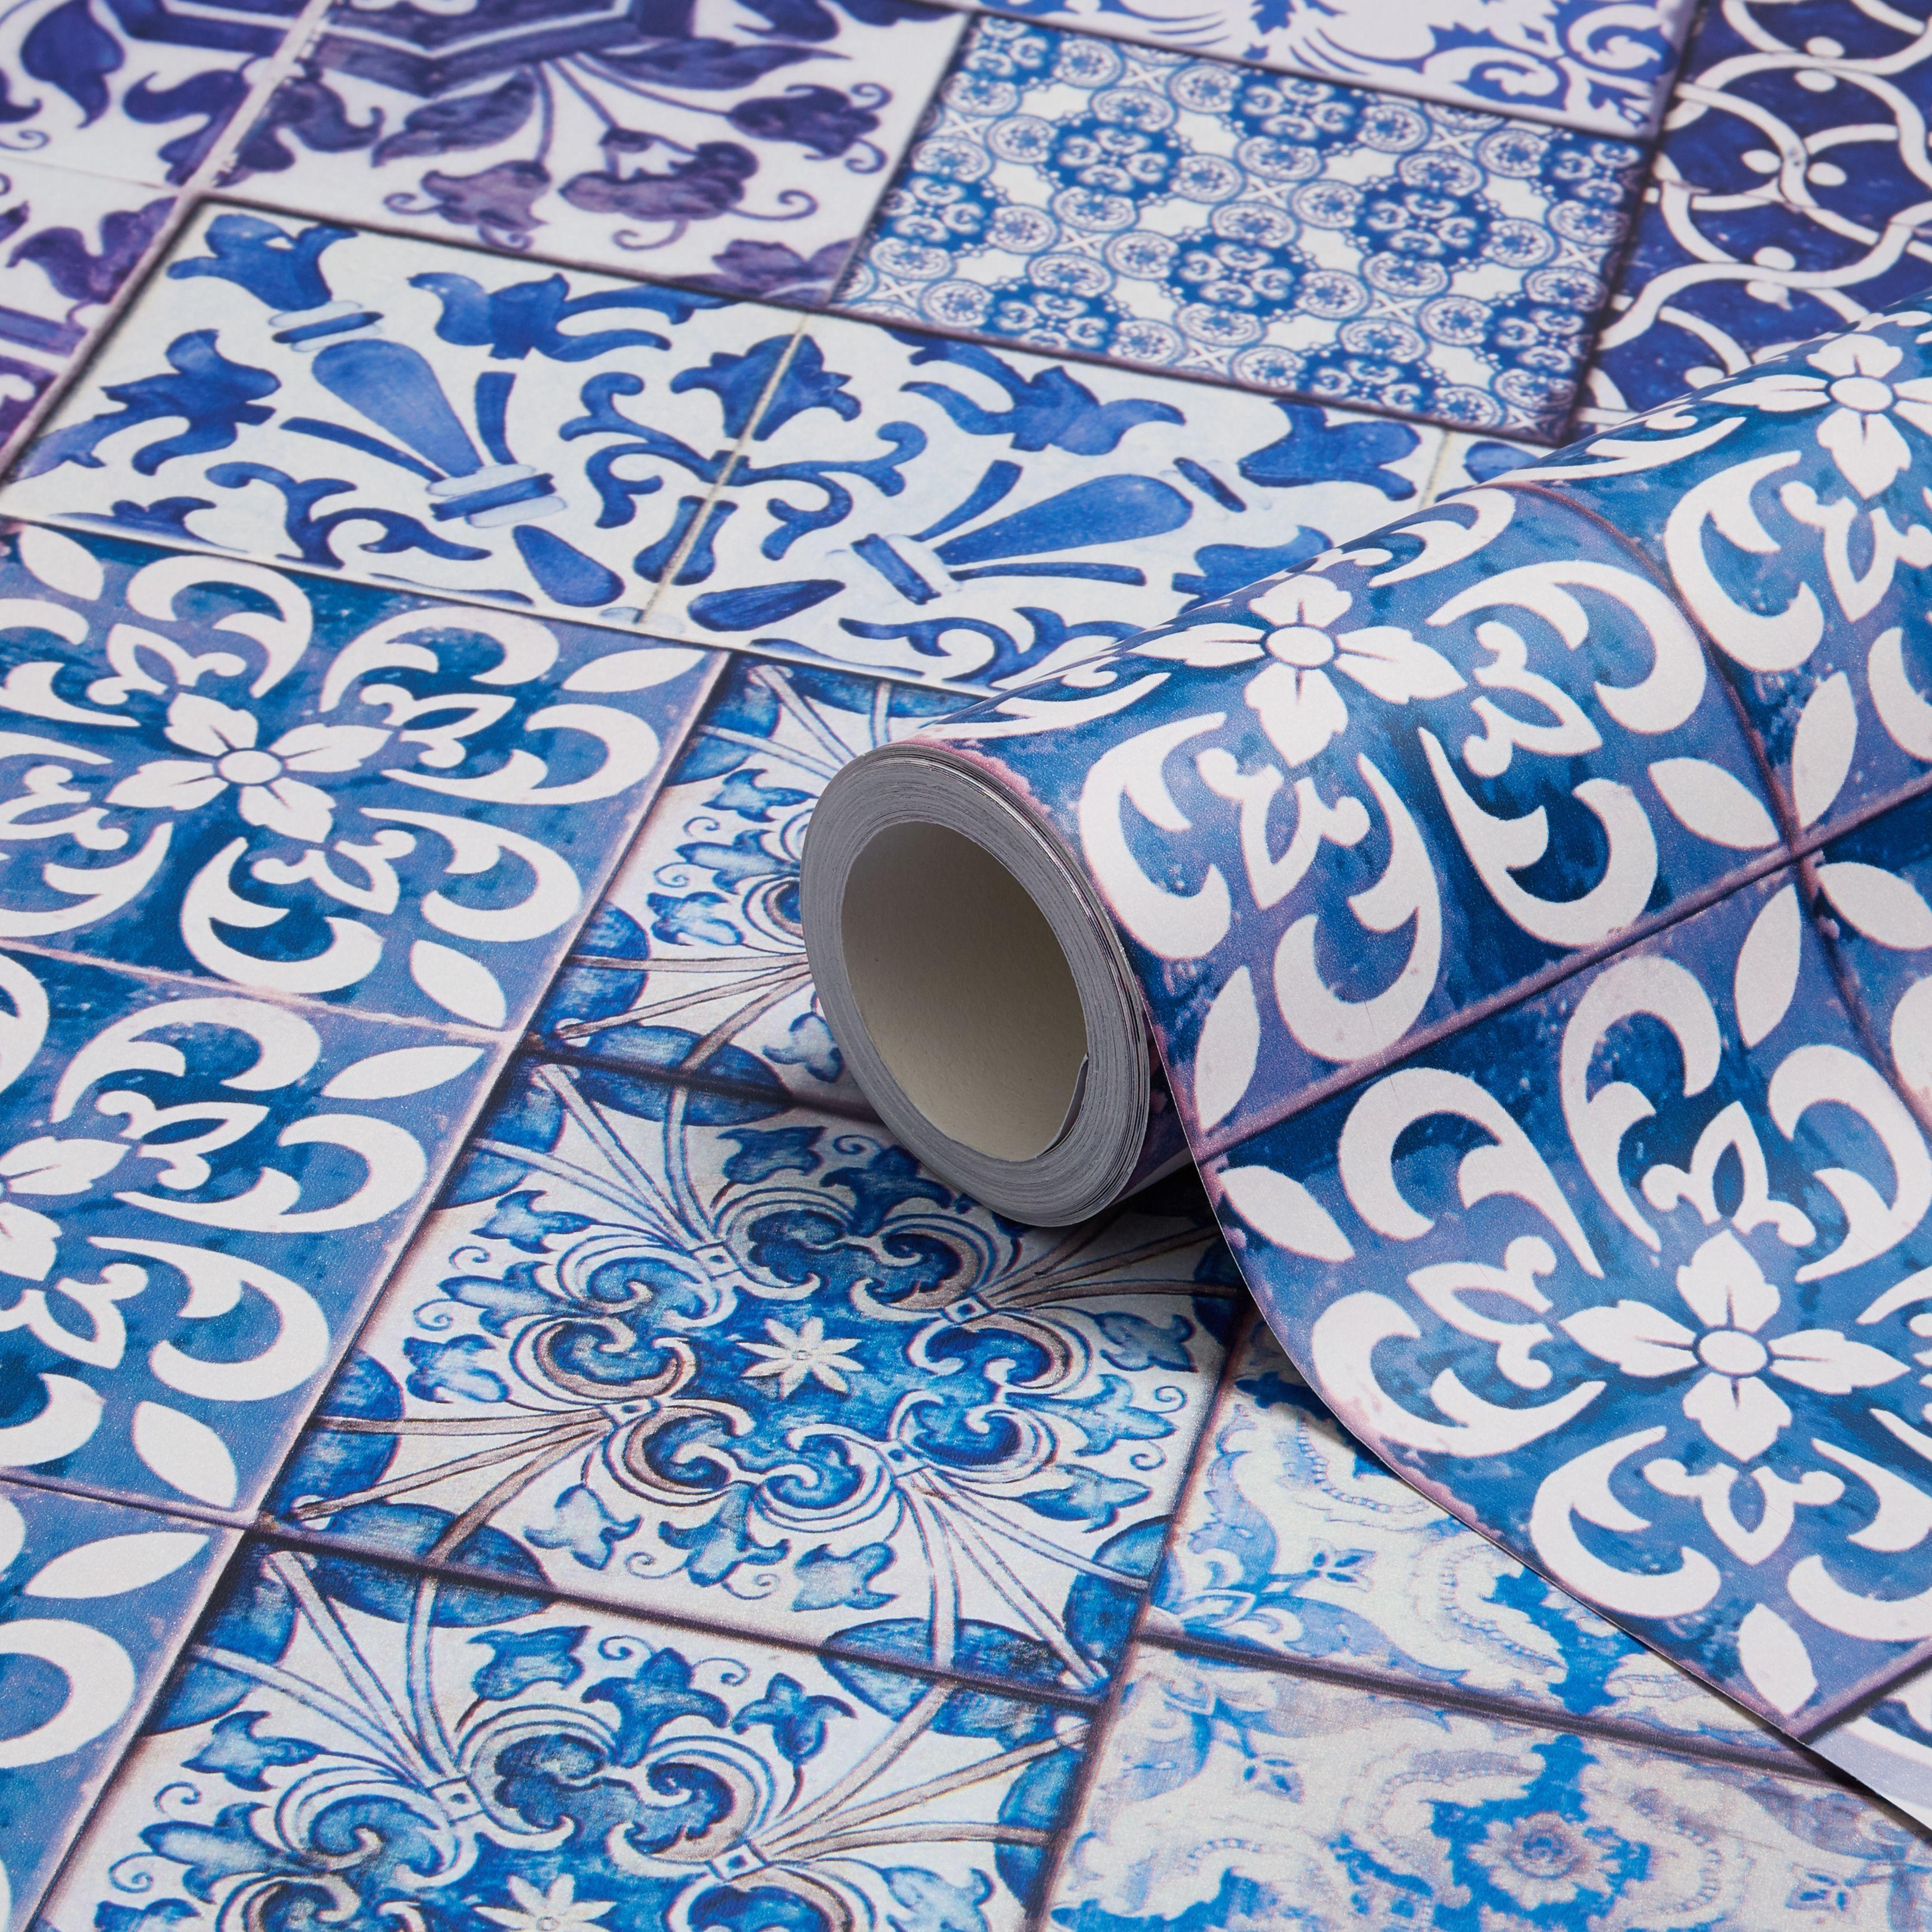 Muriva Blue Moroccan Tiles Wallpaper Departments DIY